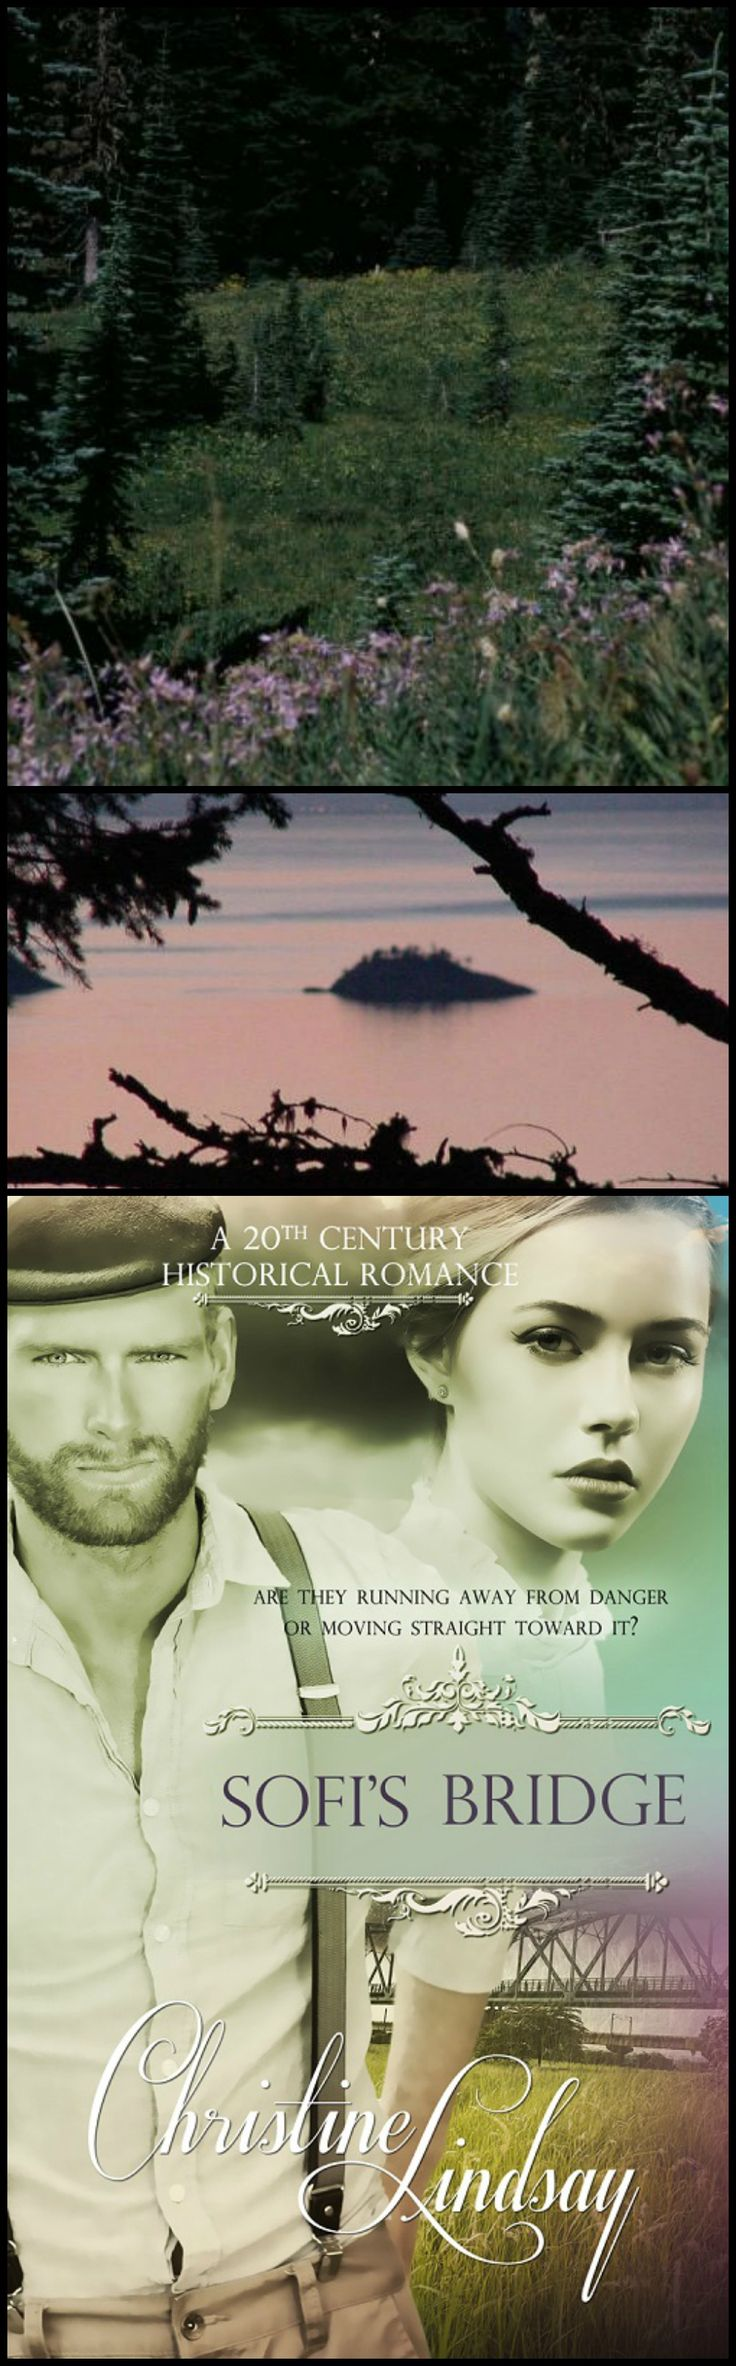 Historical romance set in Pacific Northwest. https://www.amazon.com/Sofis-Bridge-Christine-Lindsay/dp/1611165202/ref=sr_1_1?ie=UTF8&qid=1481237919&sr=8-1&keywords=sofi%27s+bridge